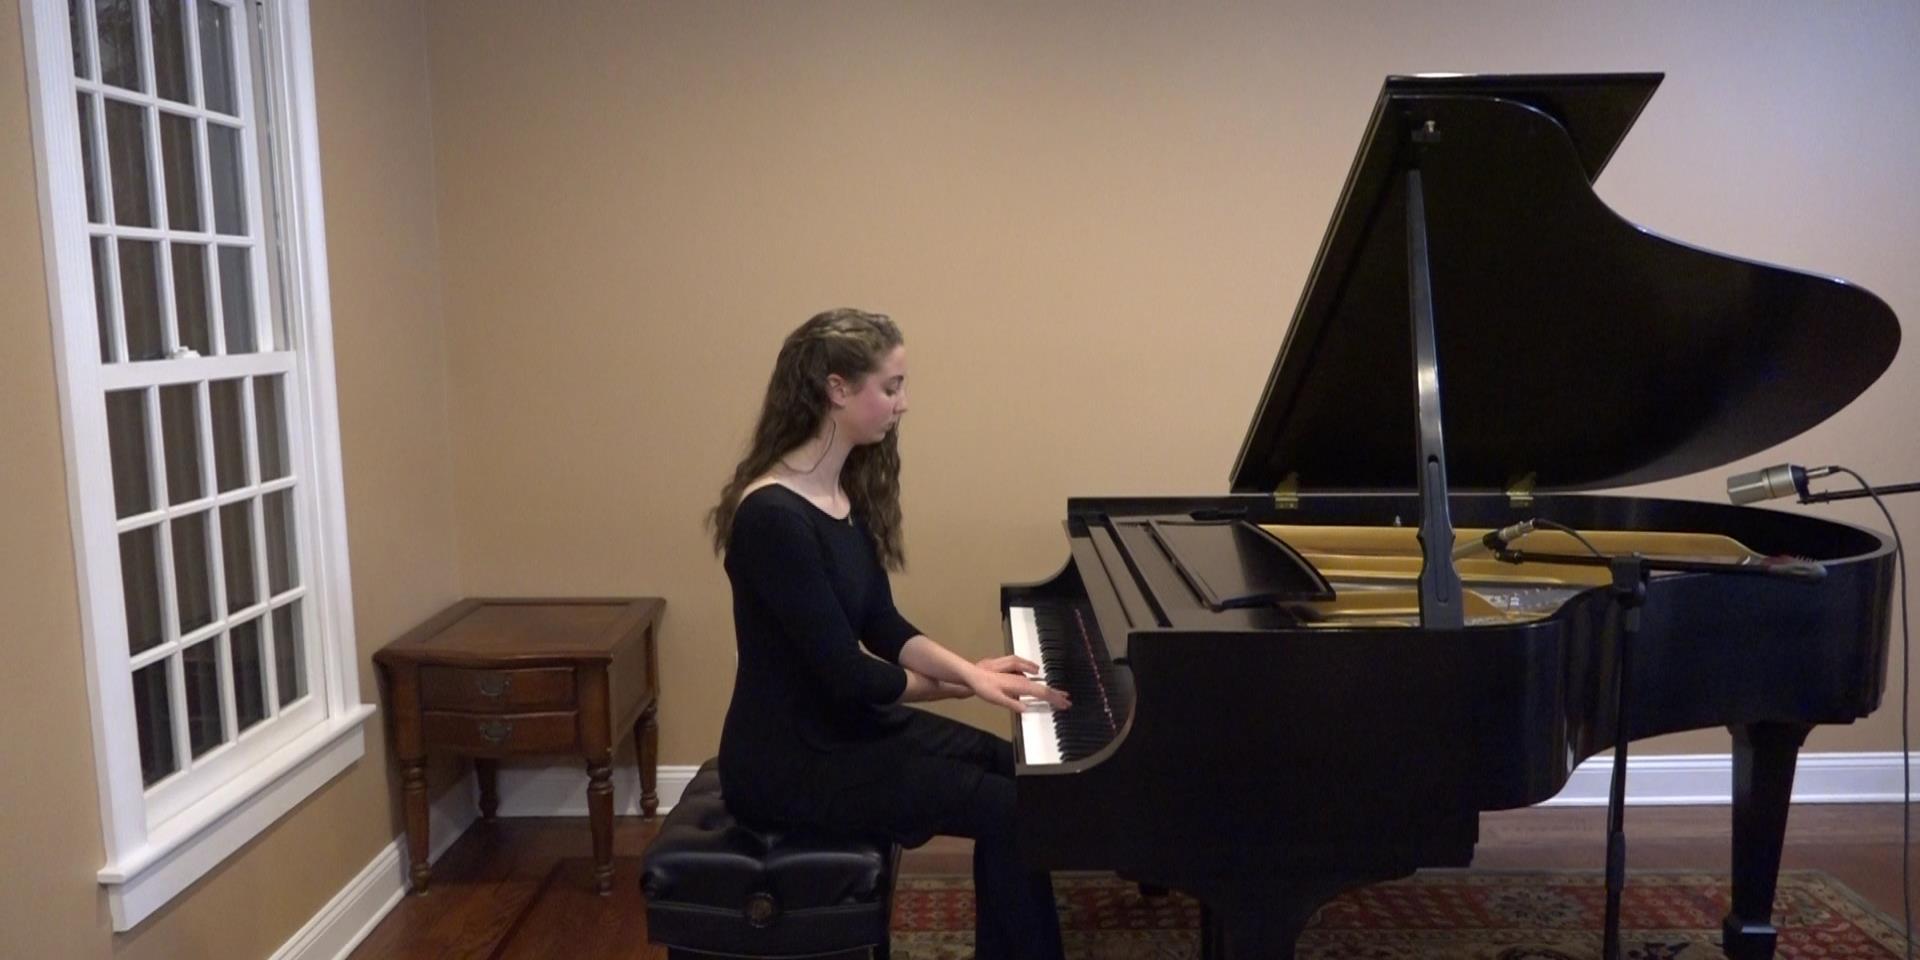 Jillian plays Debussy